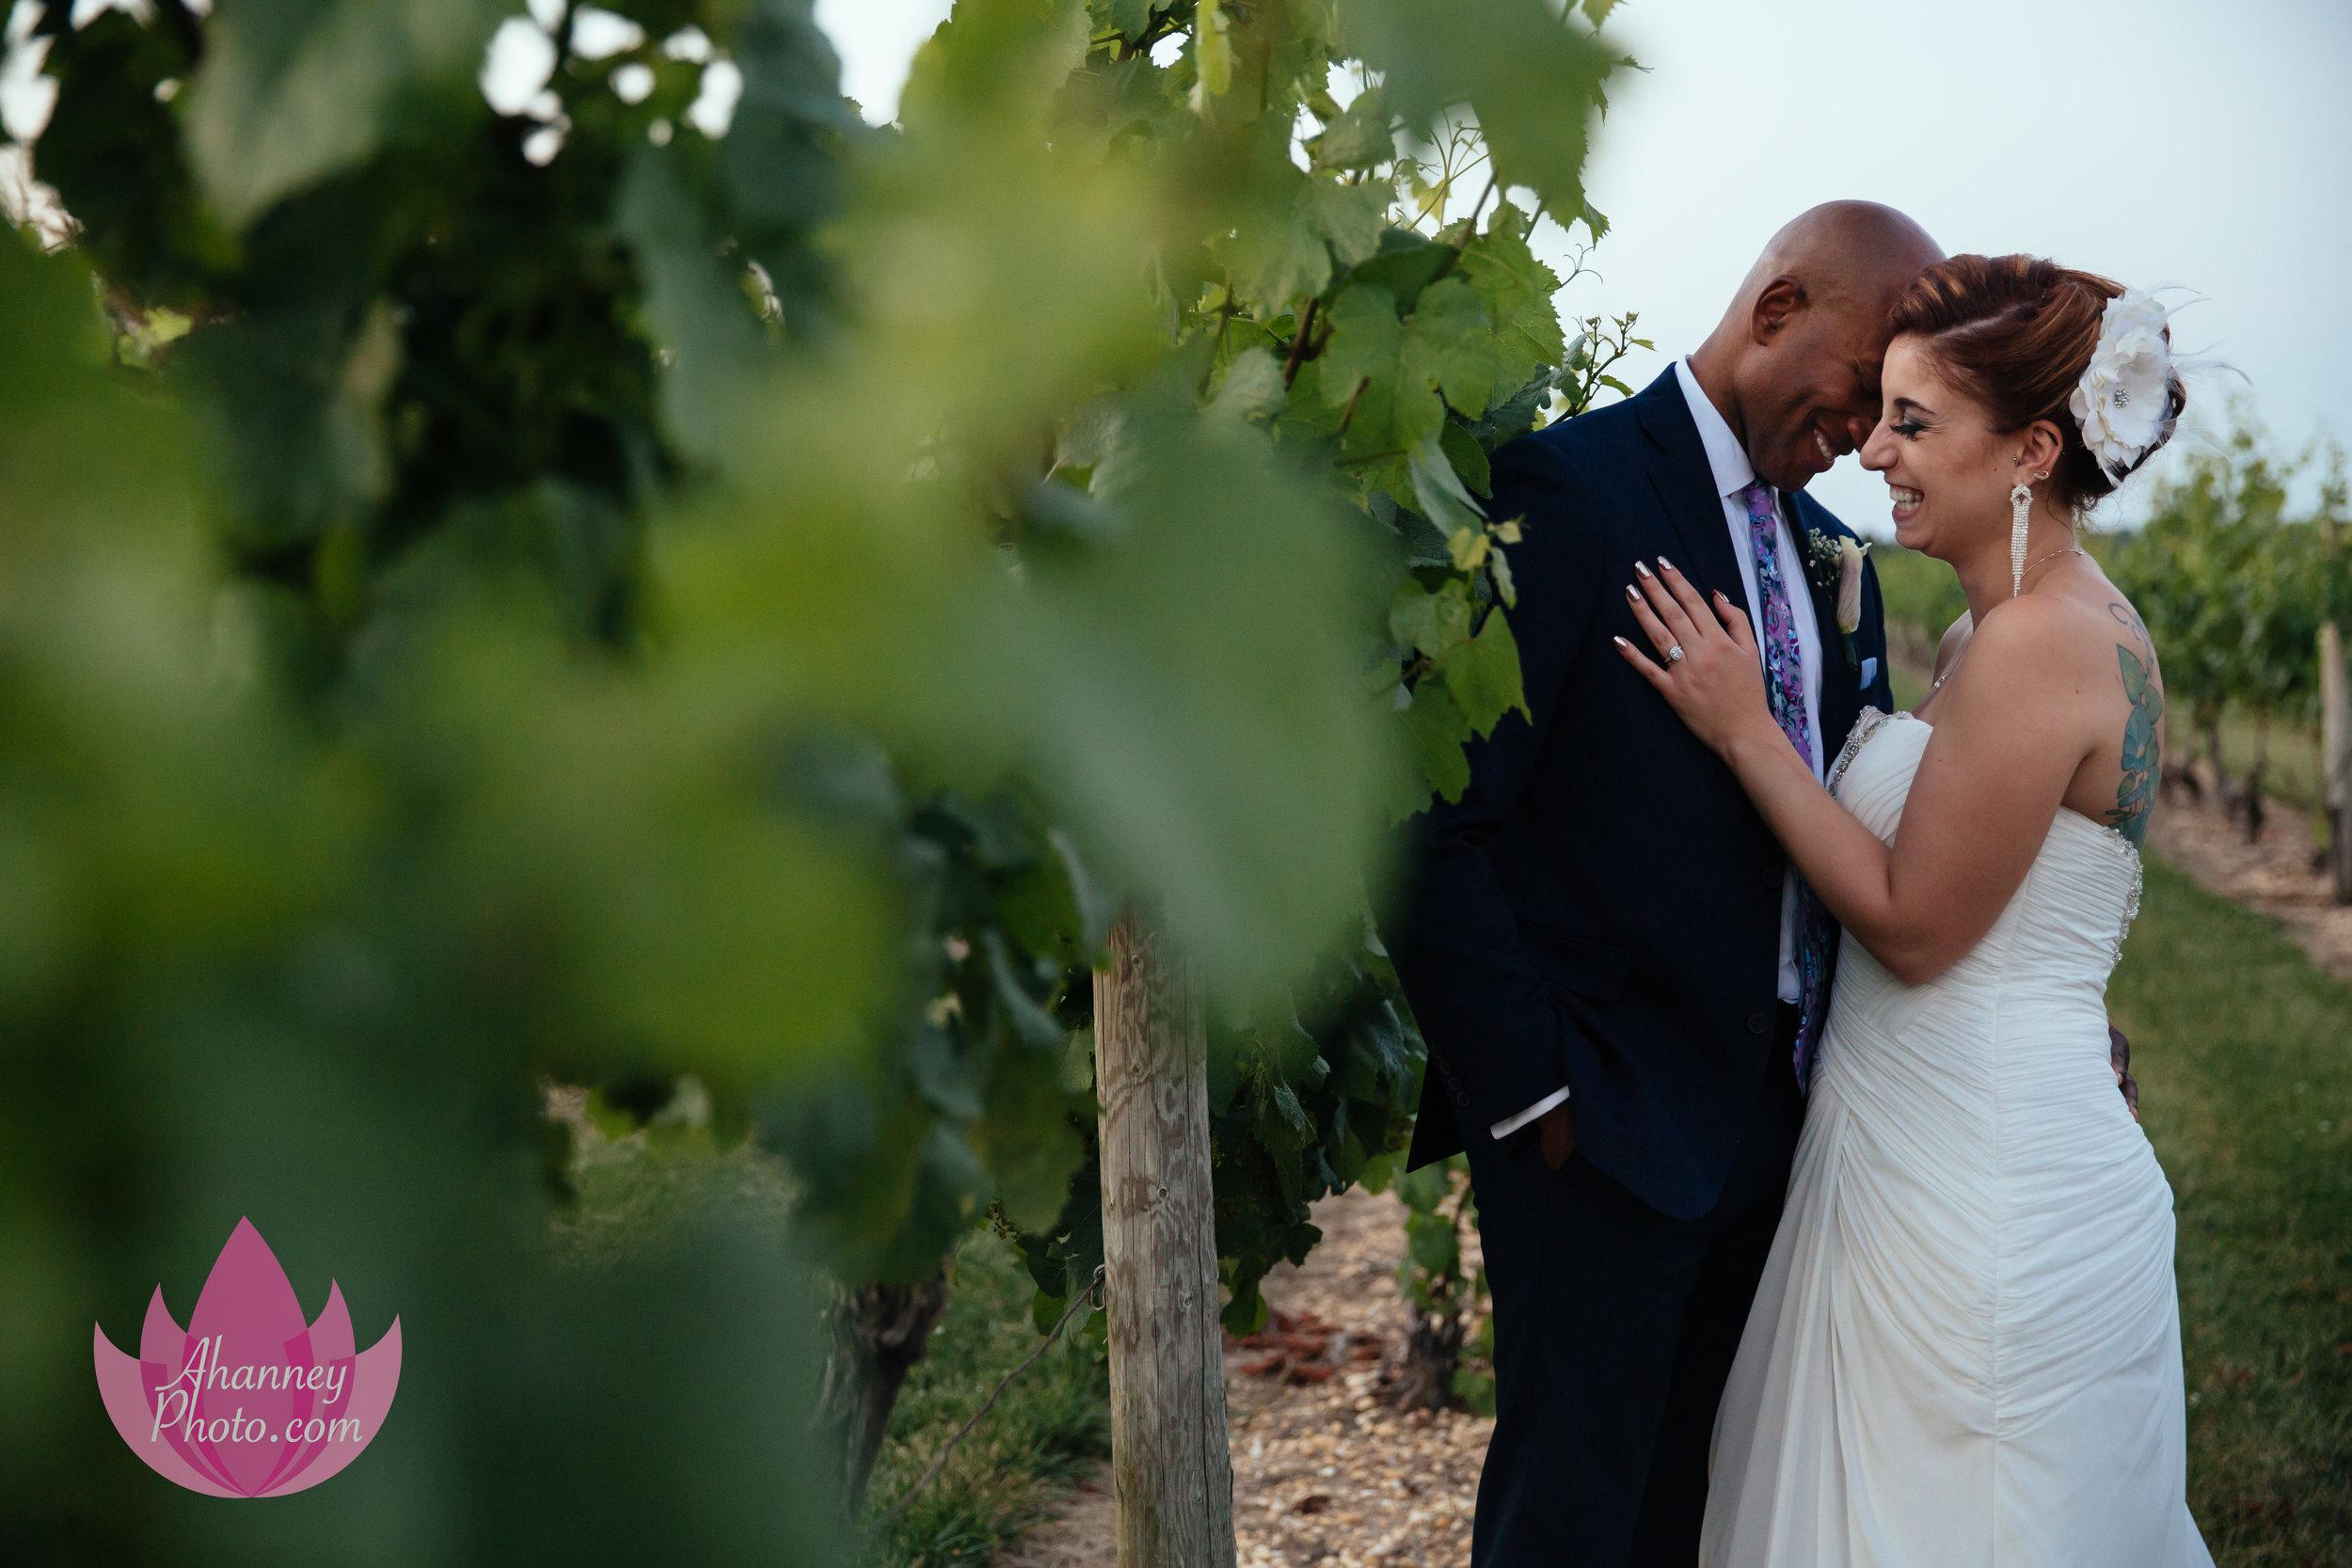 Wedding Couple in Tomasello Winery Vineyard Hammonton New Jersey Philadelphia Delaware Anastasia Hanney Photography AHanneyPhoto